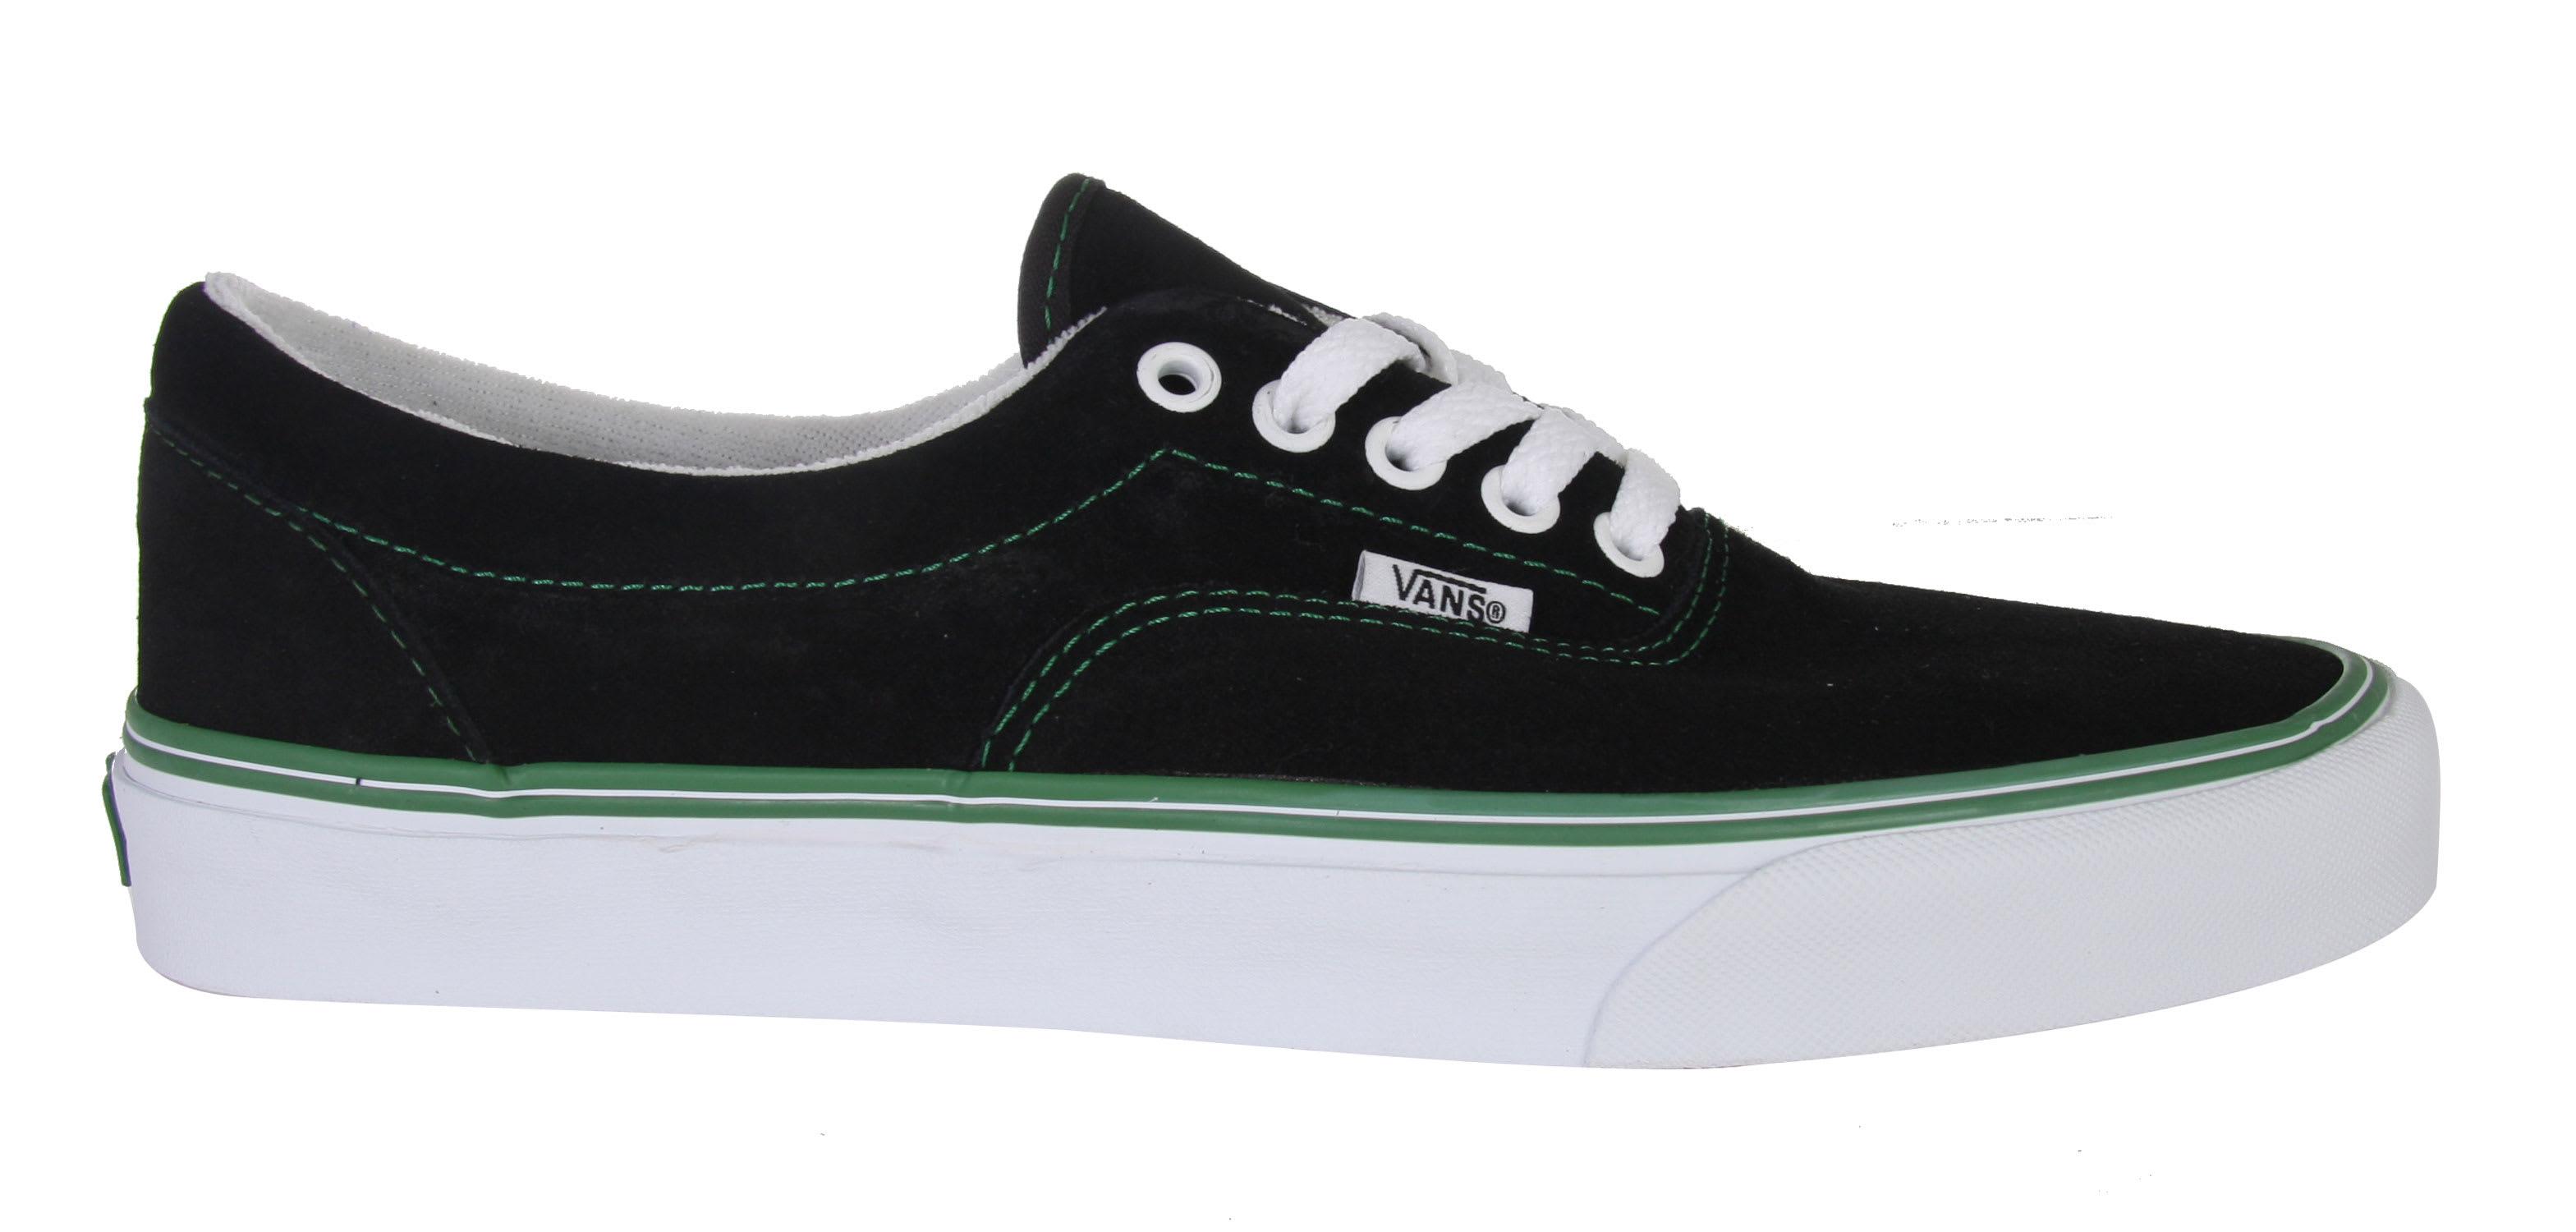 3ded8bf11c Vans Era Skate Shoes - thumbnail 1